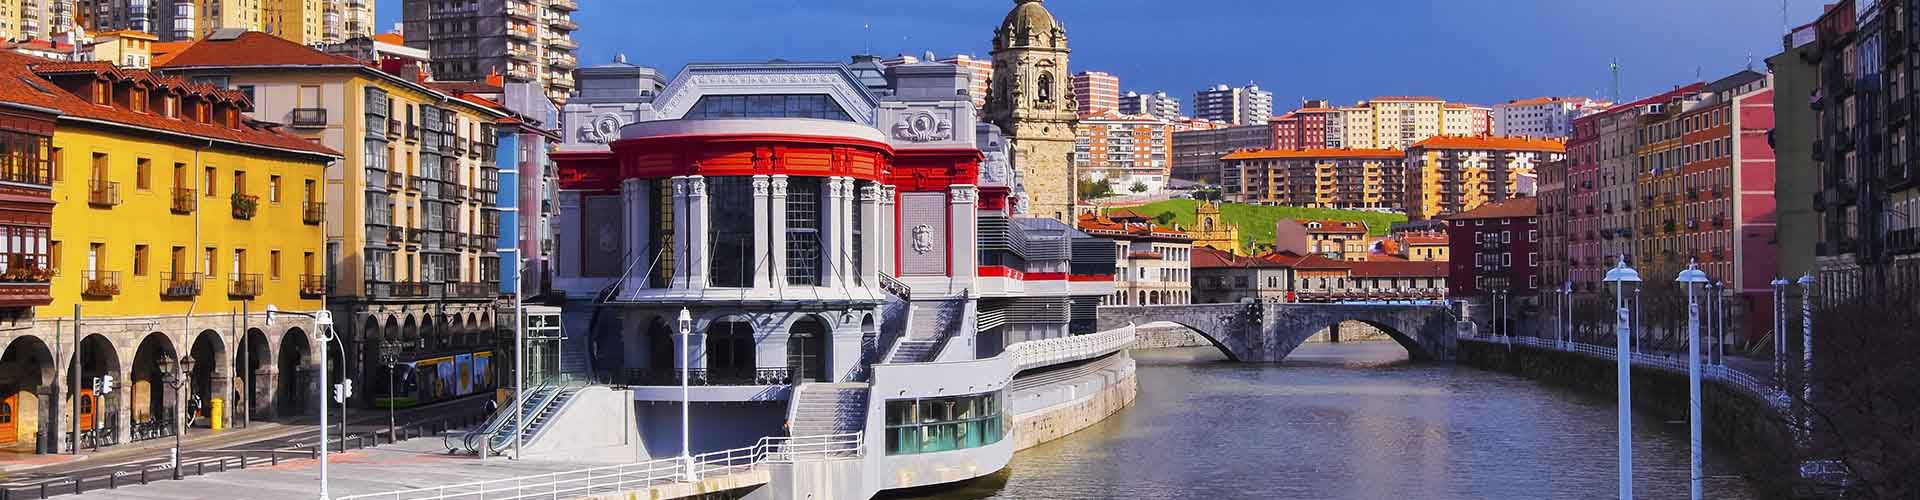 Bilbao - Hoteles baratos cerca a City Center. Mapas de Bilbao, Fotos y comentarios de cada Hotel en Bilbao.